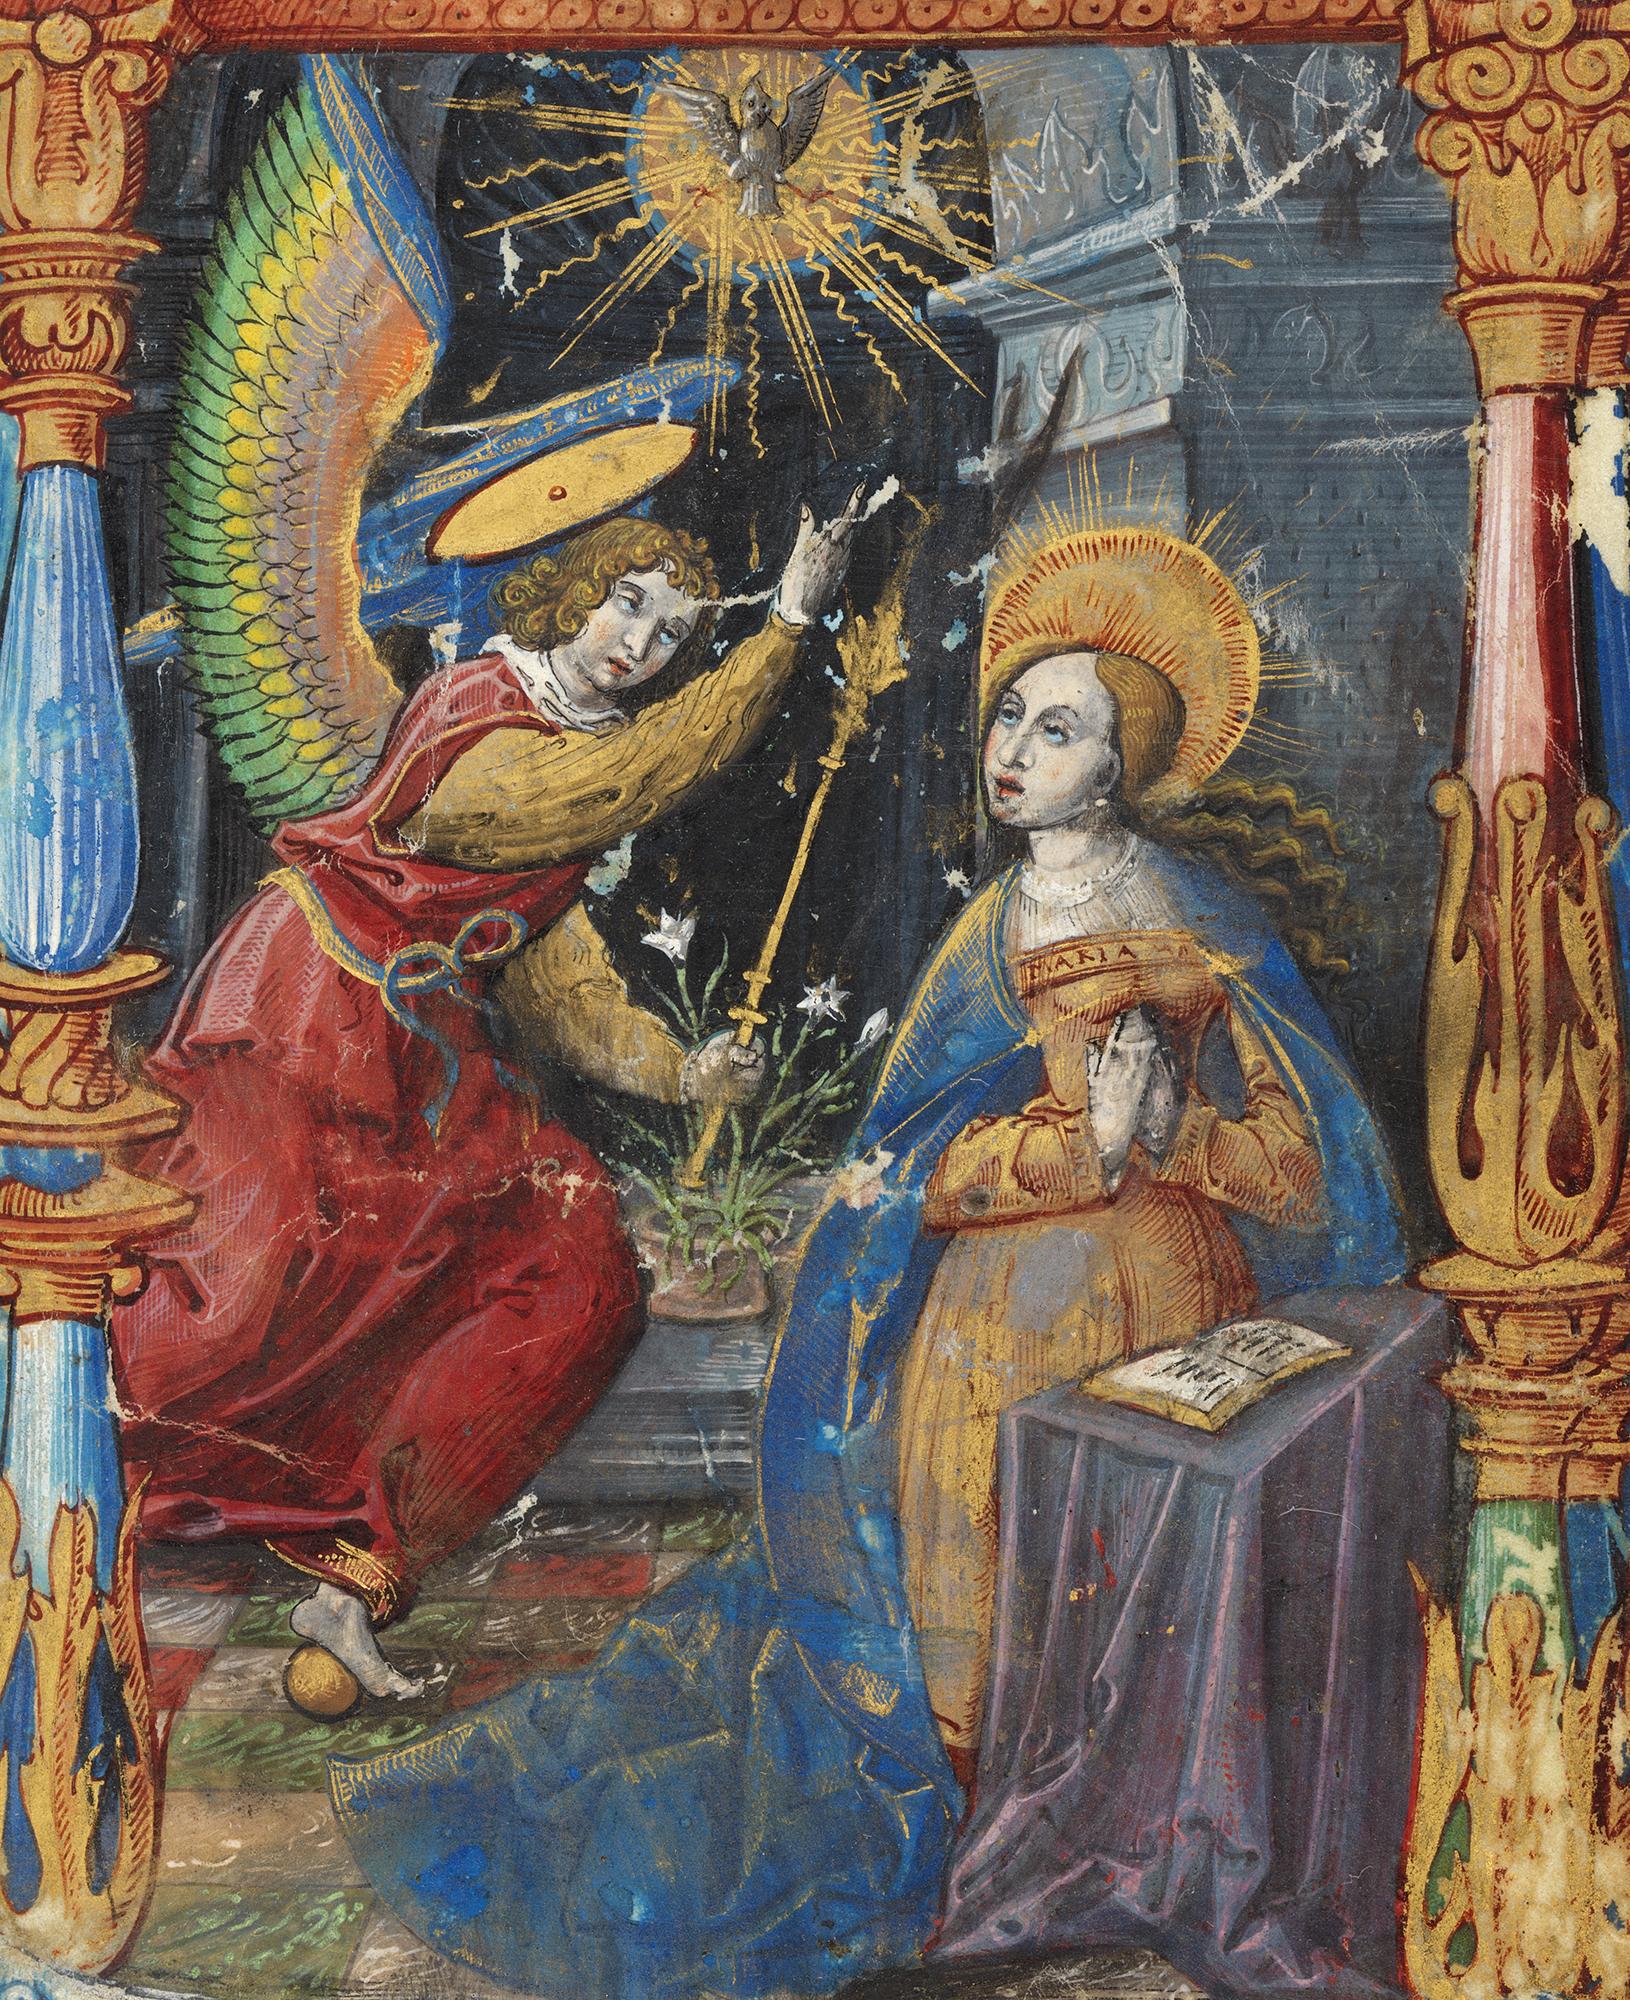 An illumination depicting a religious, Christian scene.